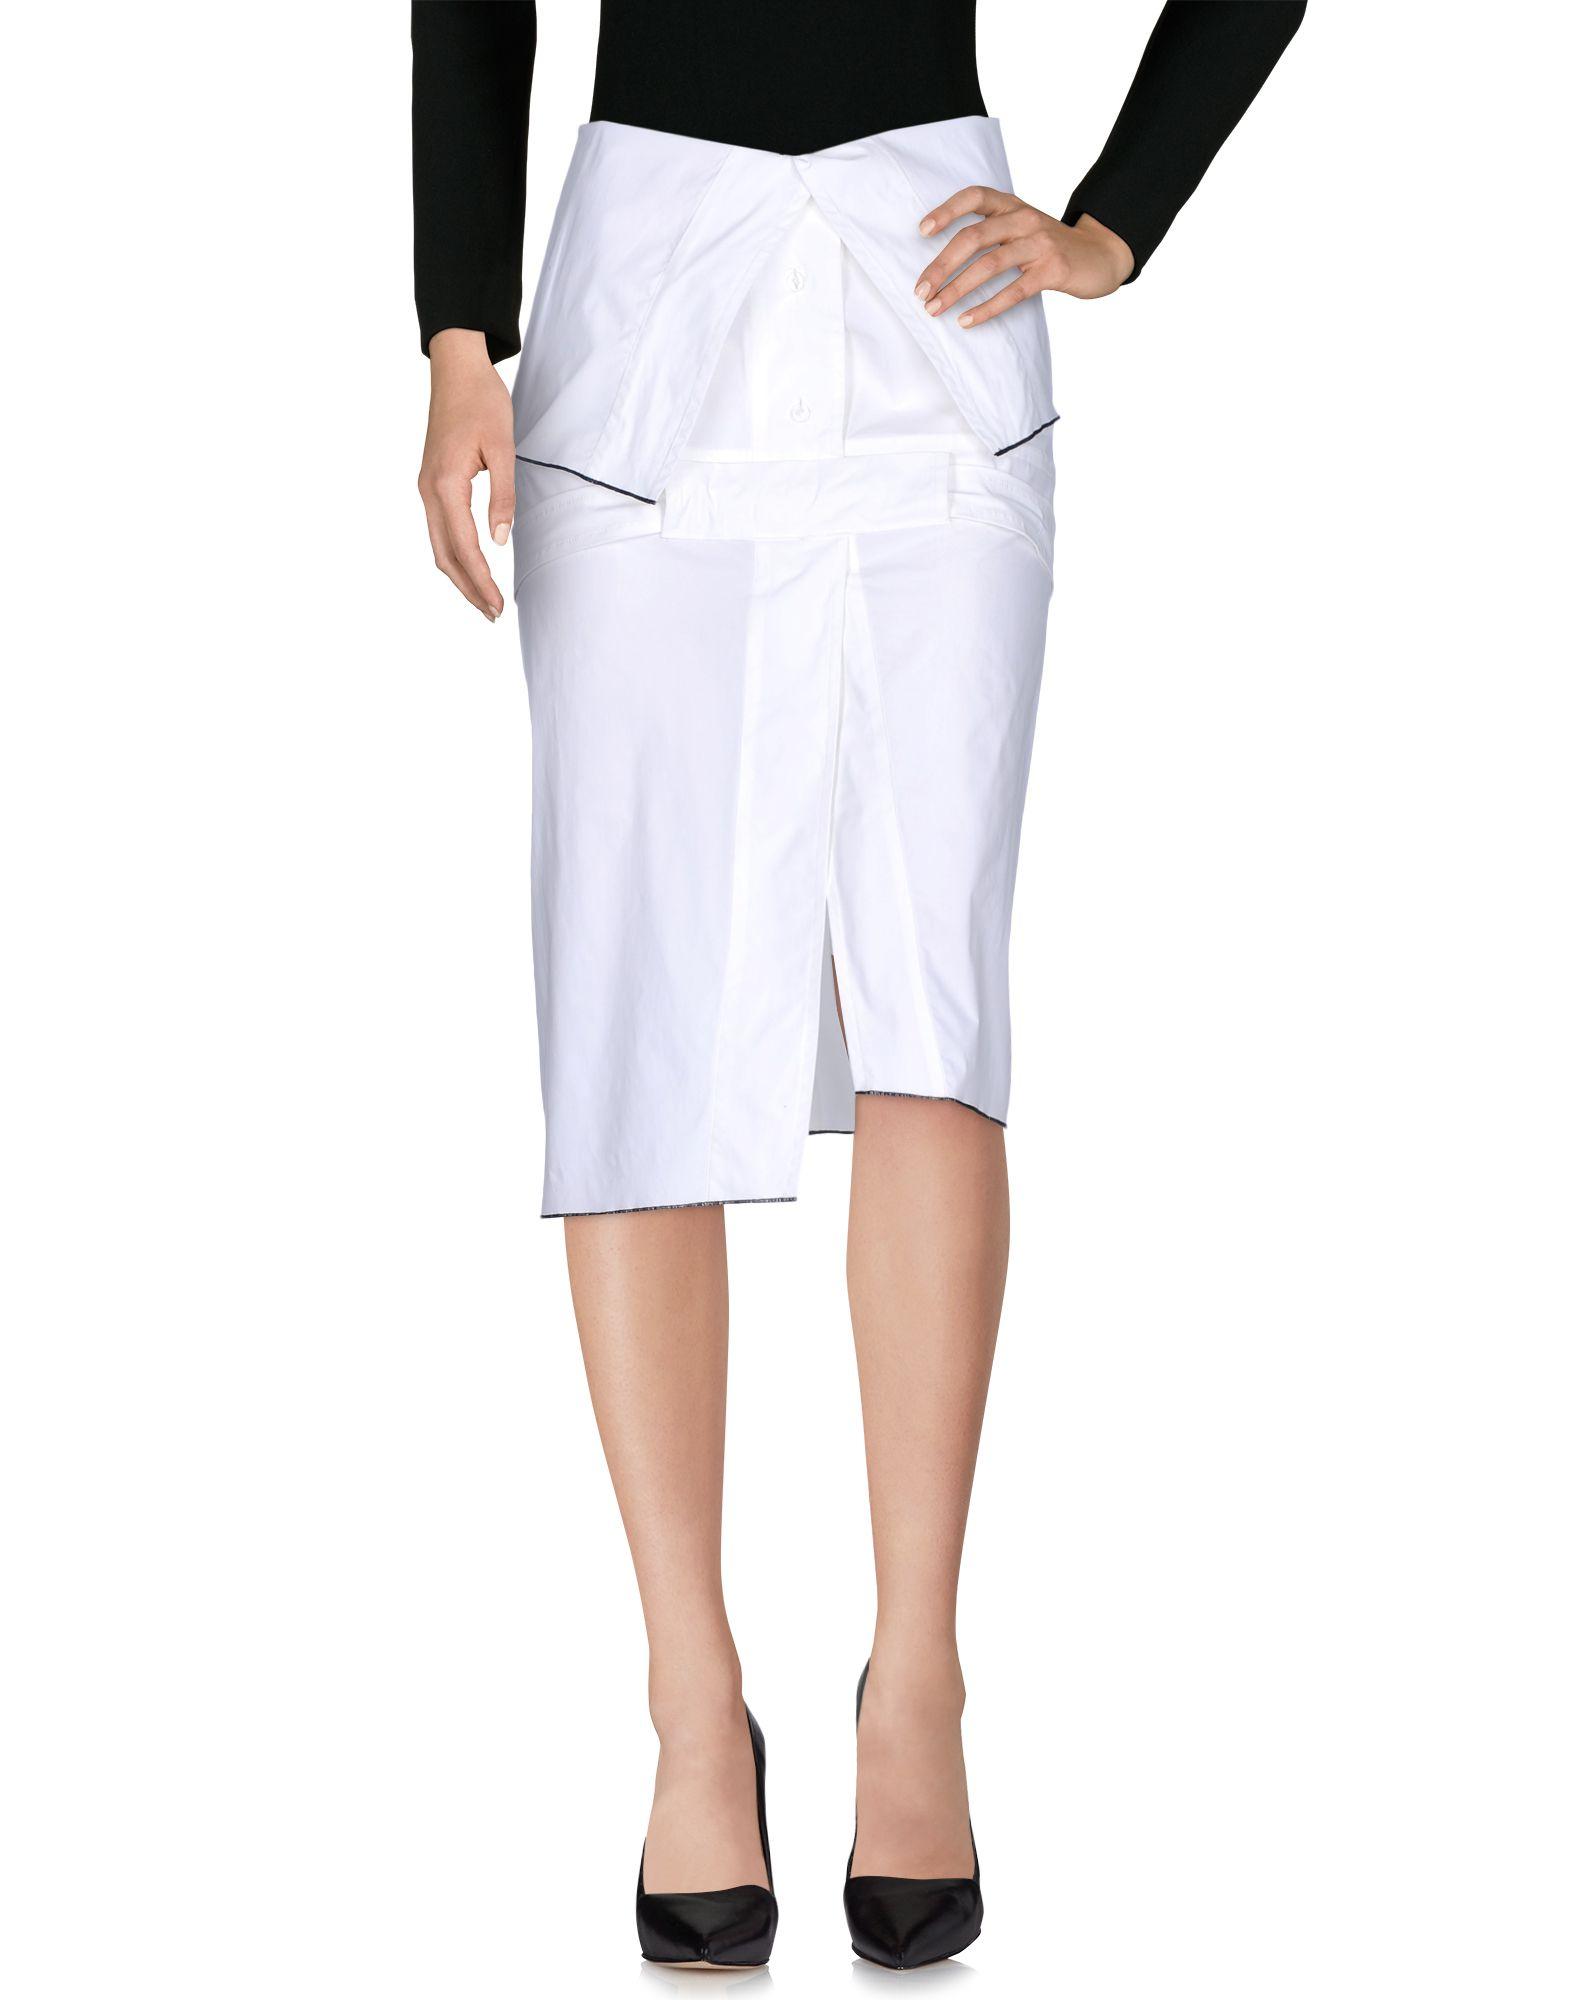 HAAL Knee Length Skirts in White